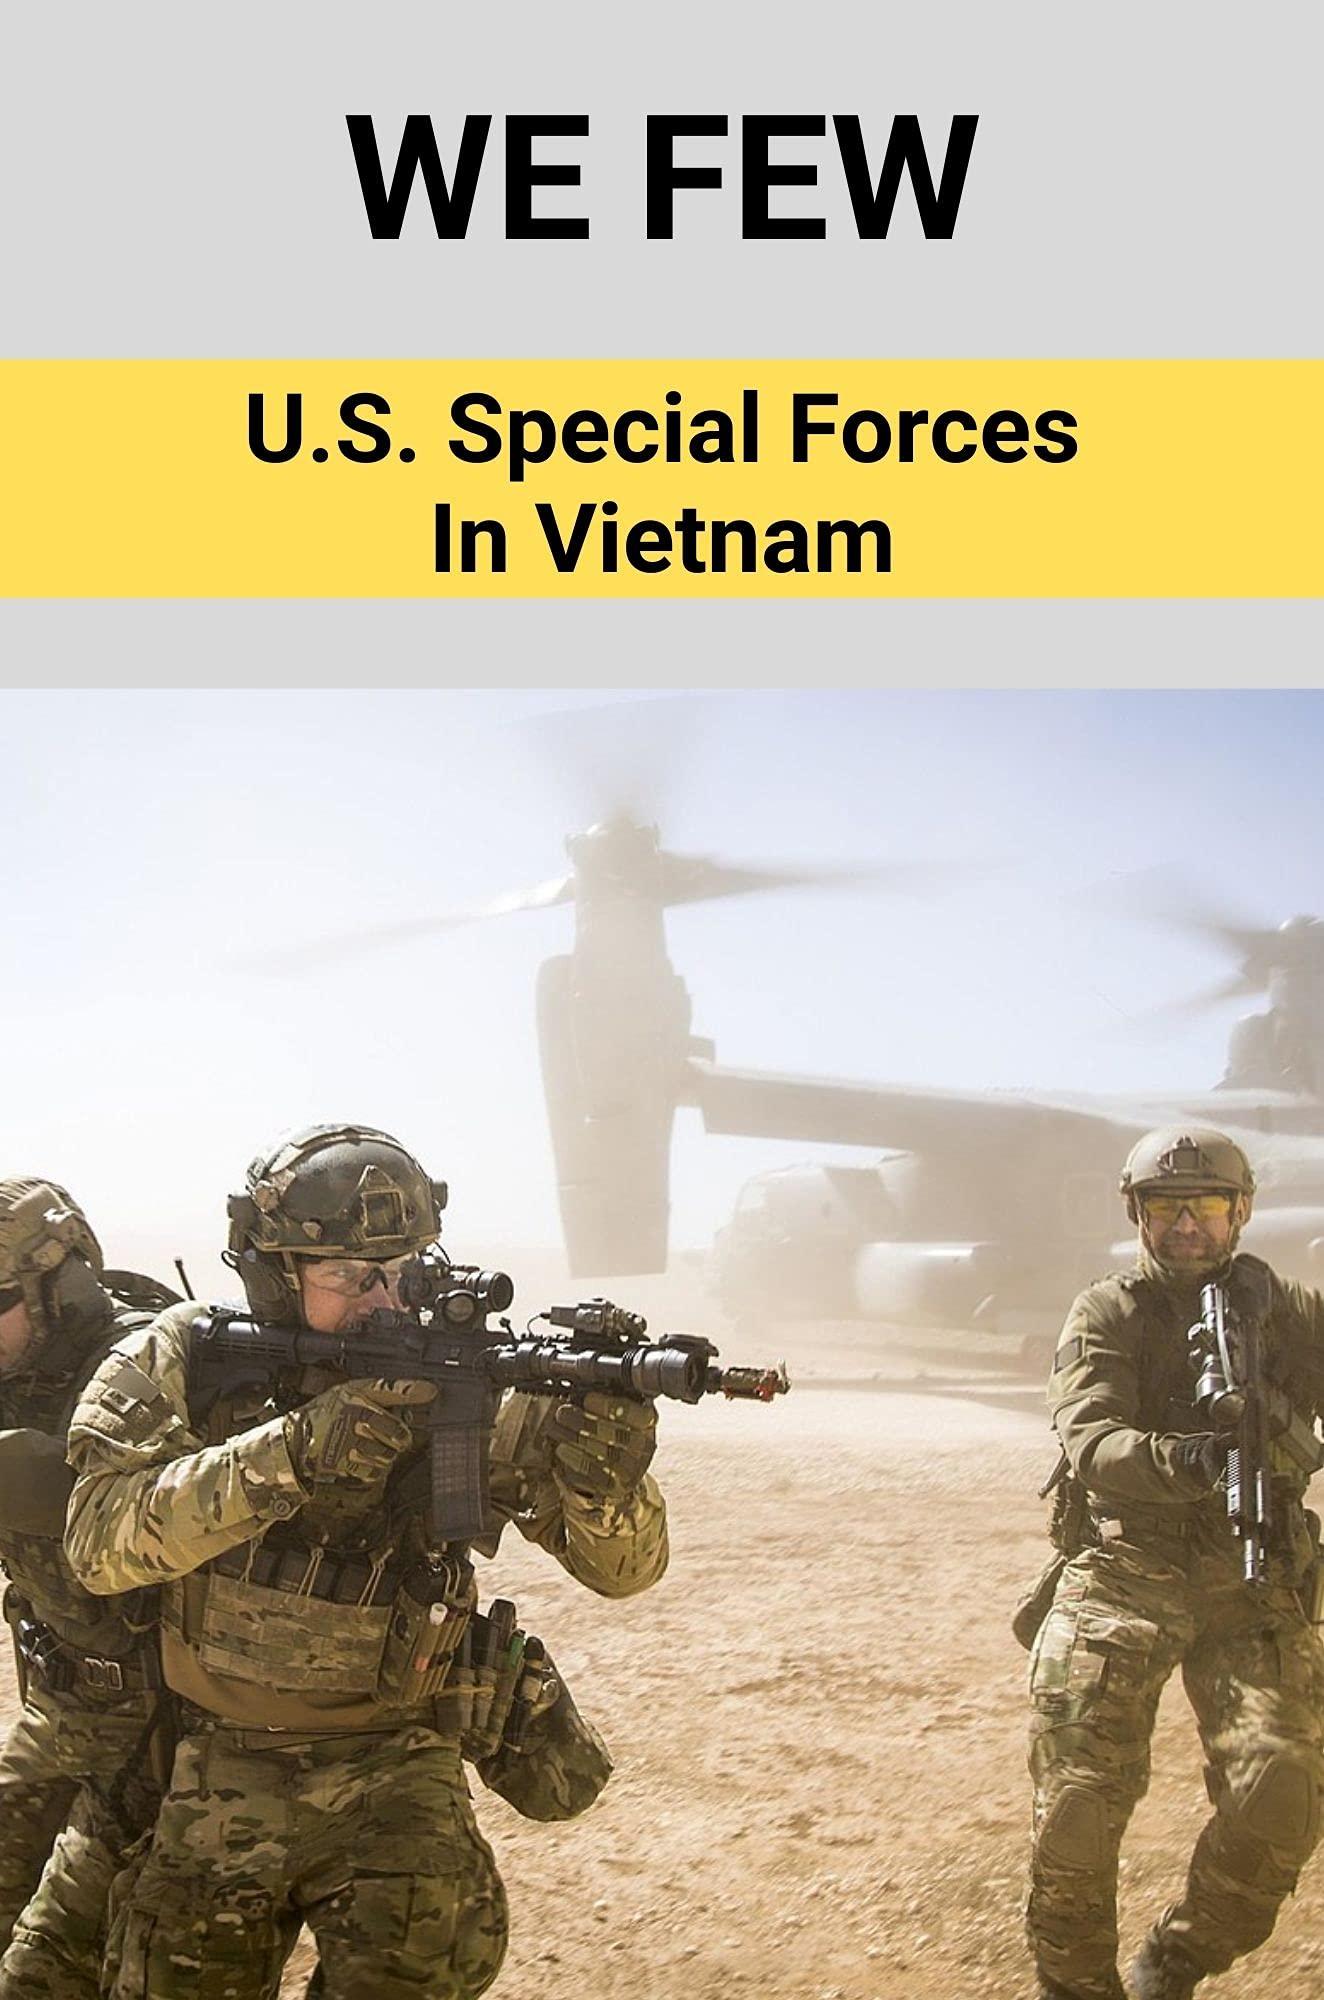 We Few: U.S. Special Forces In Vietnam: Vietnam War Biography Books